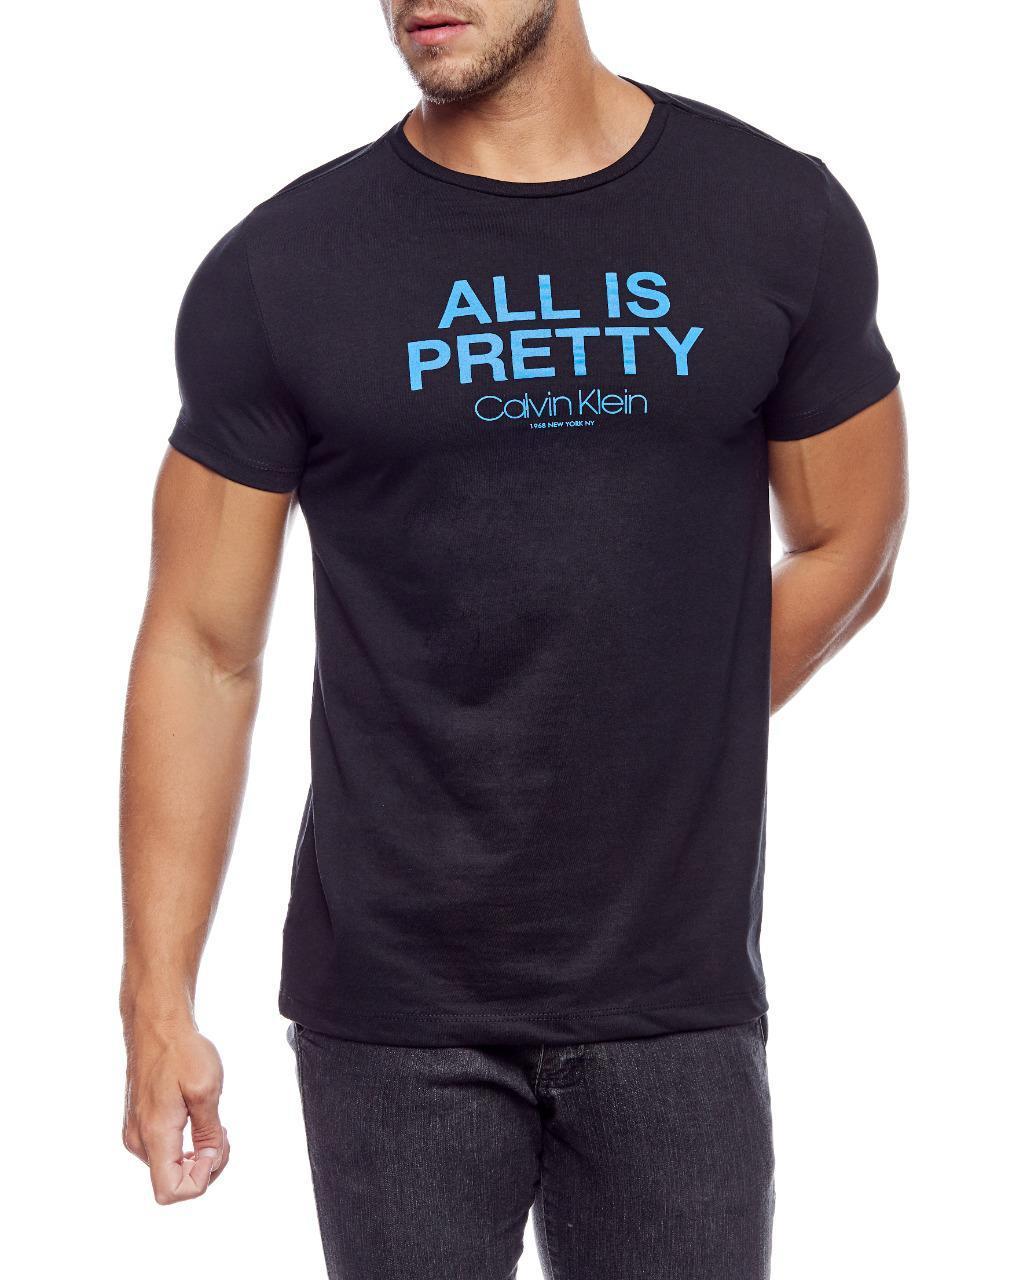 Camiseta Calvin Klein Masculina Regular Fit All Is Pretty New York Preto